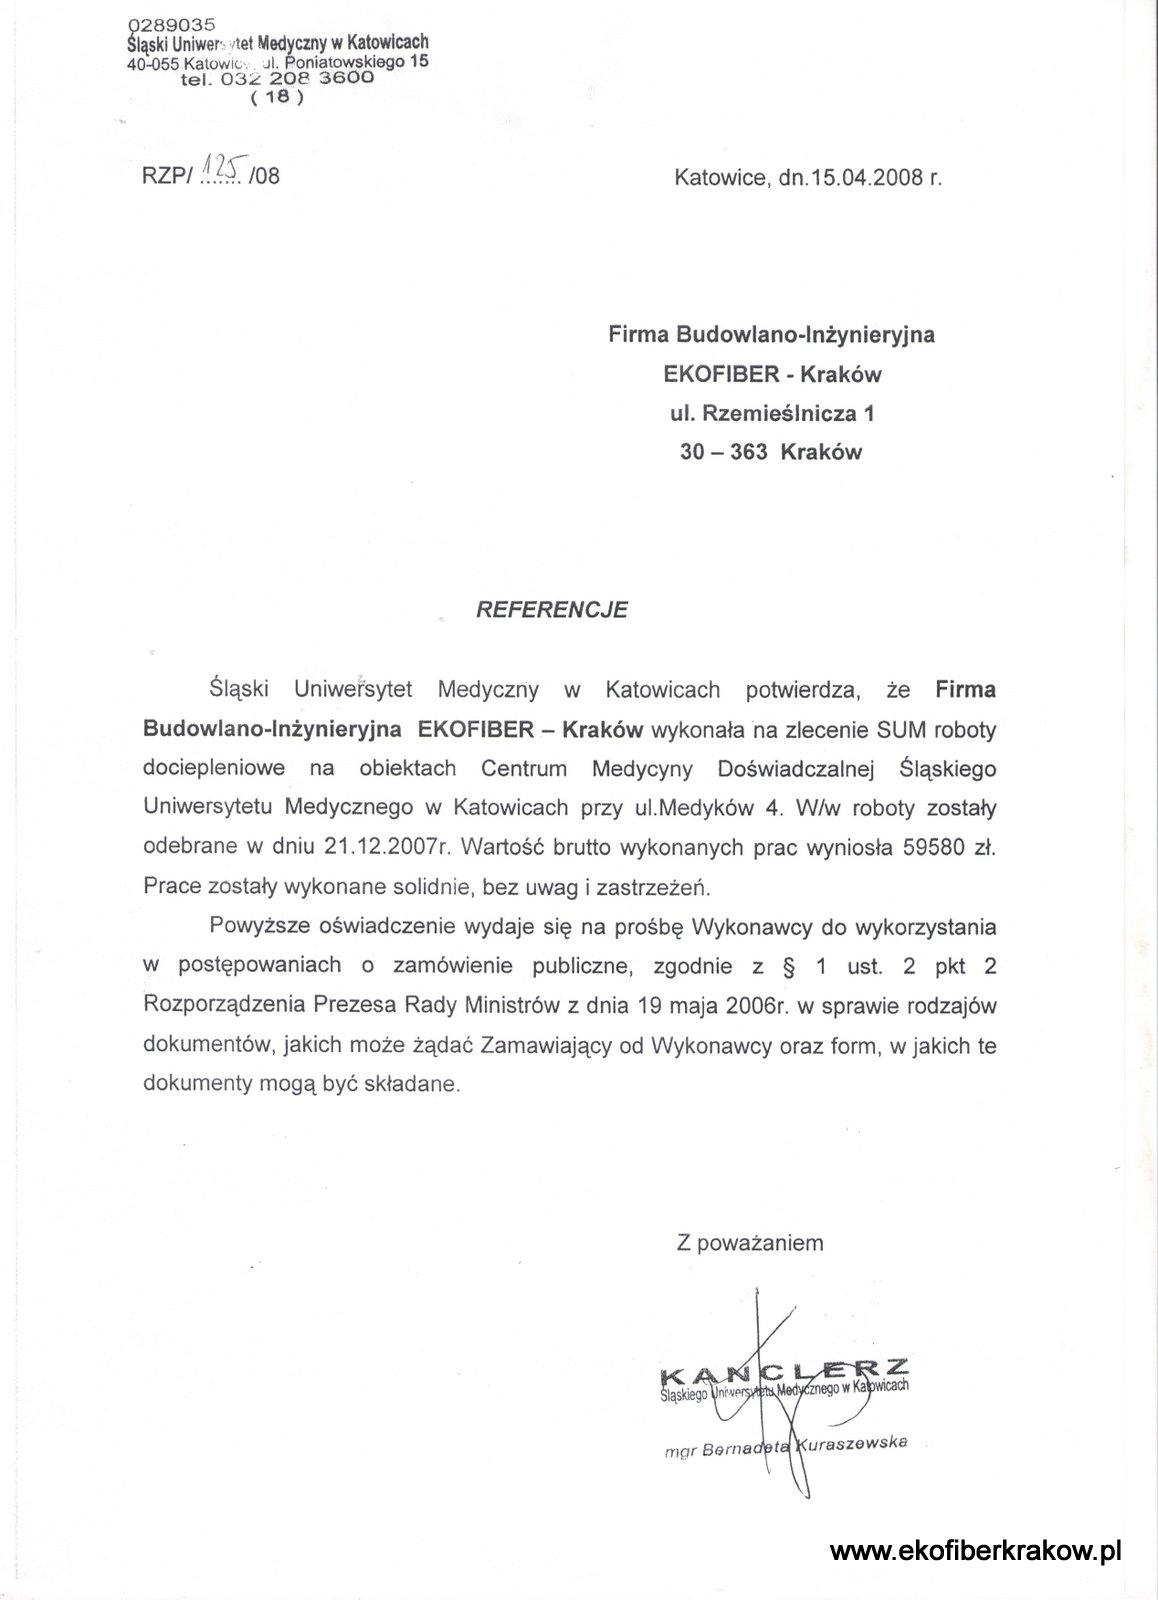 Referencje Śląski Uniwersytet Medyczny